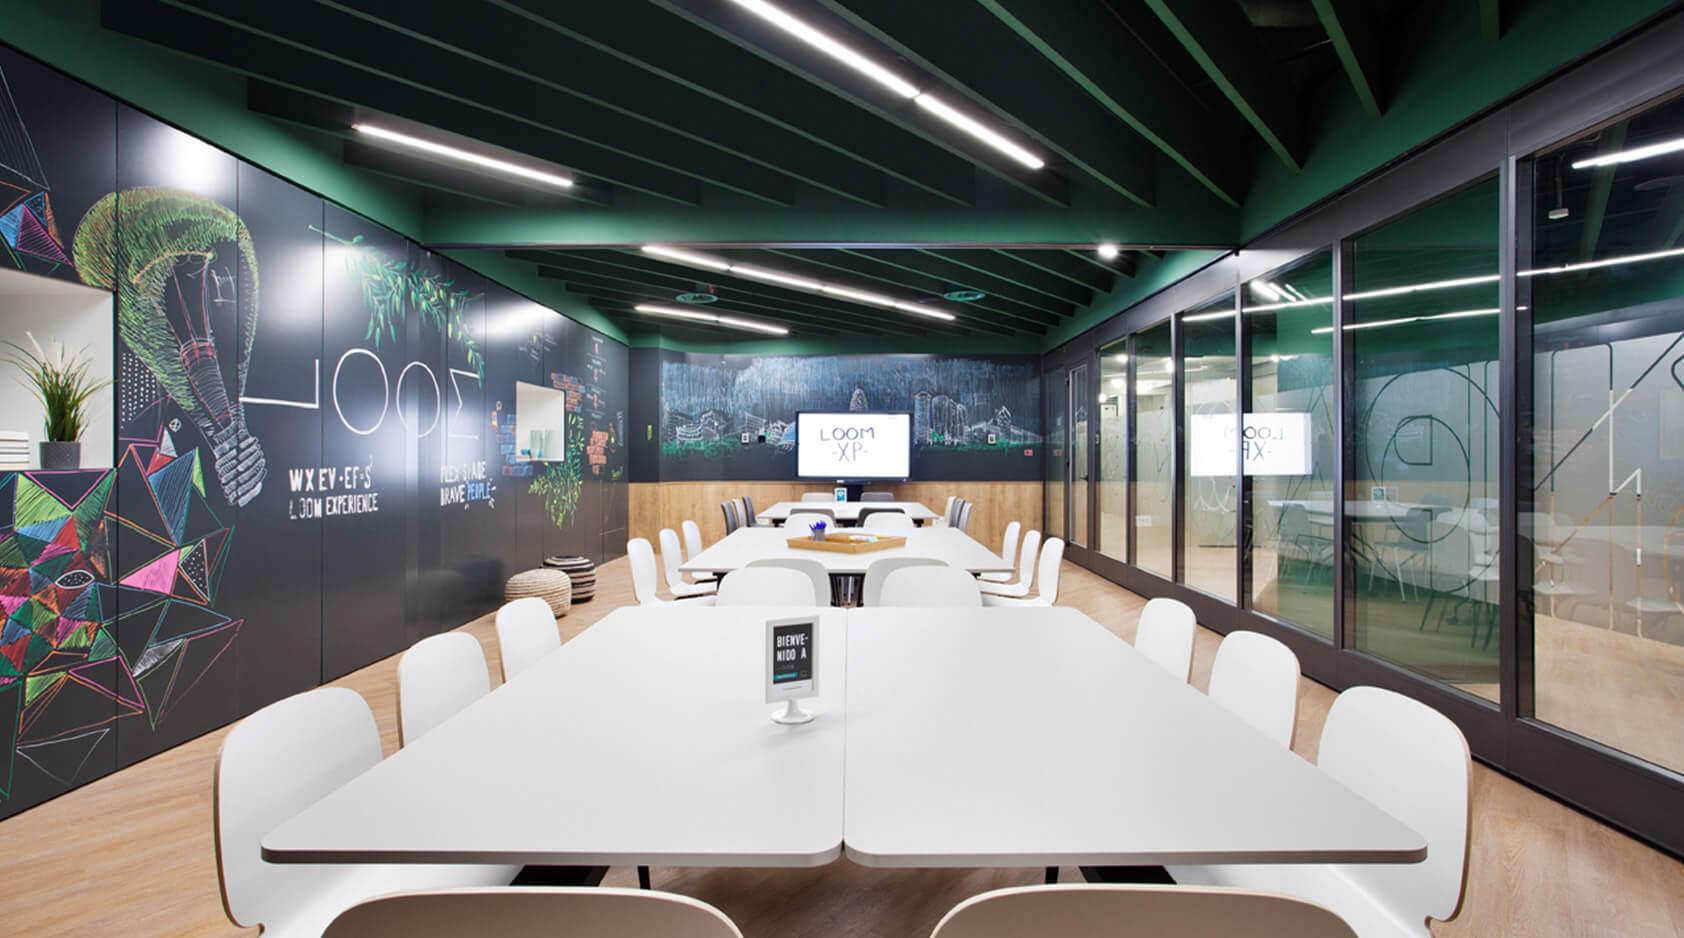 Sala-de-reuniones_SR3_Curiosidad_3Porosonic